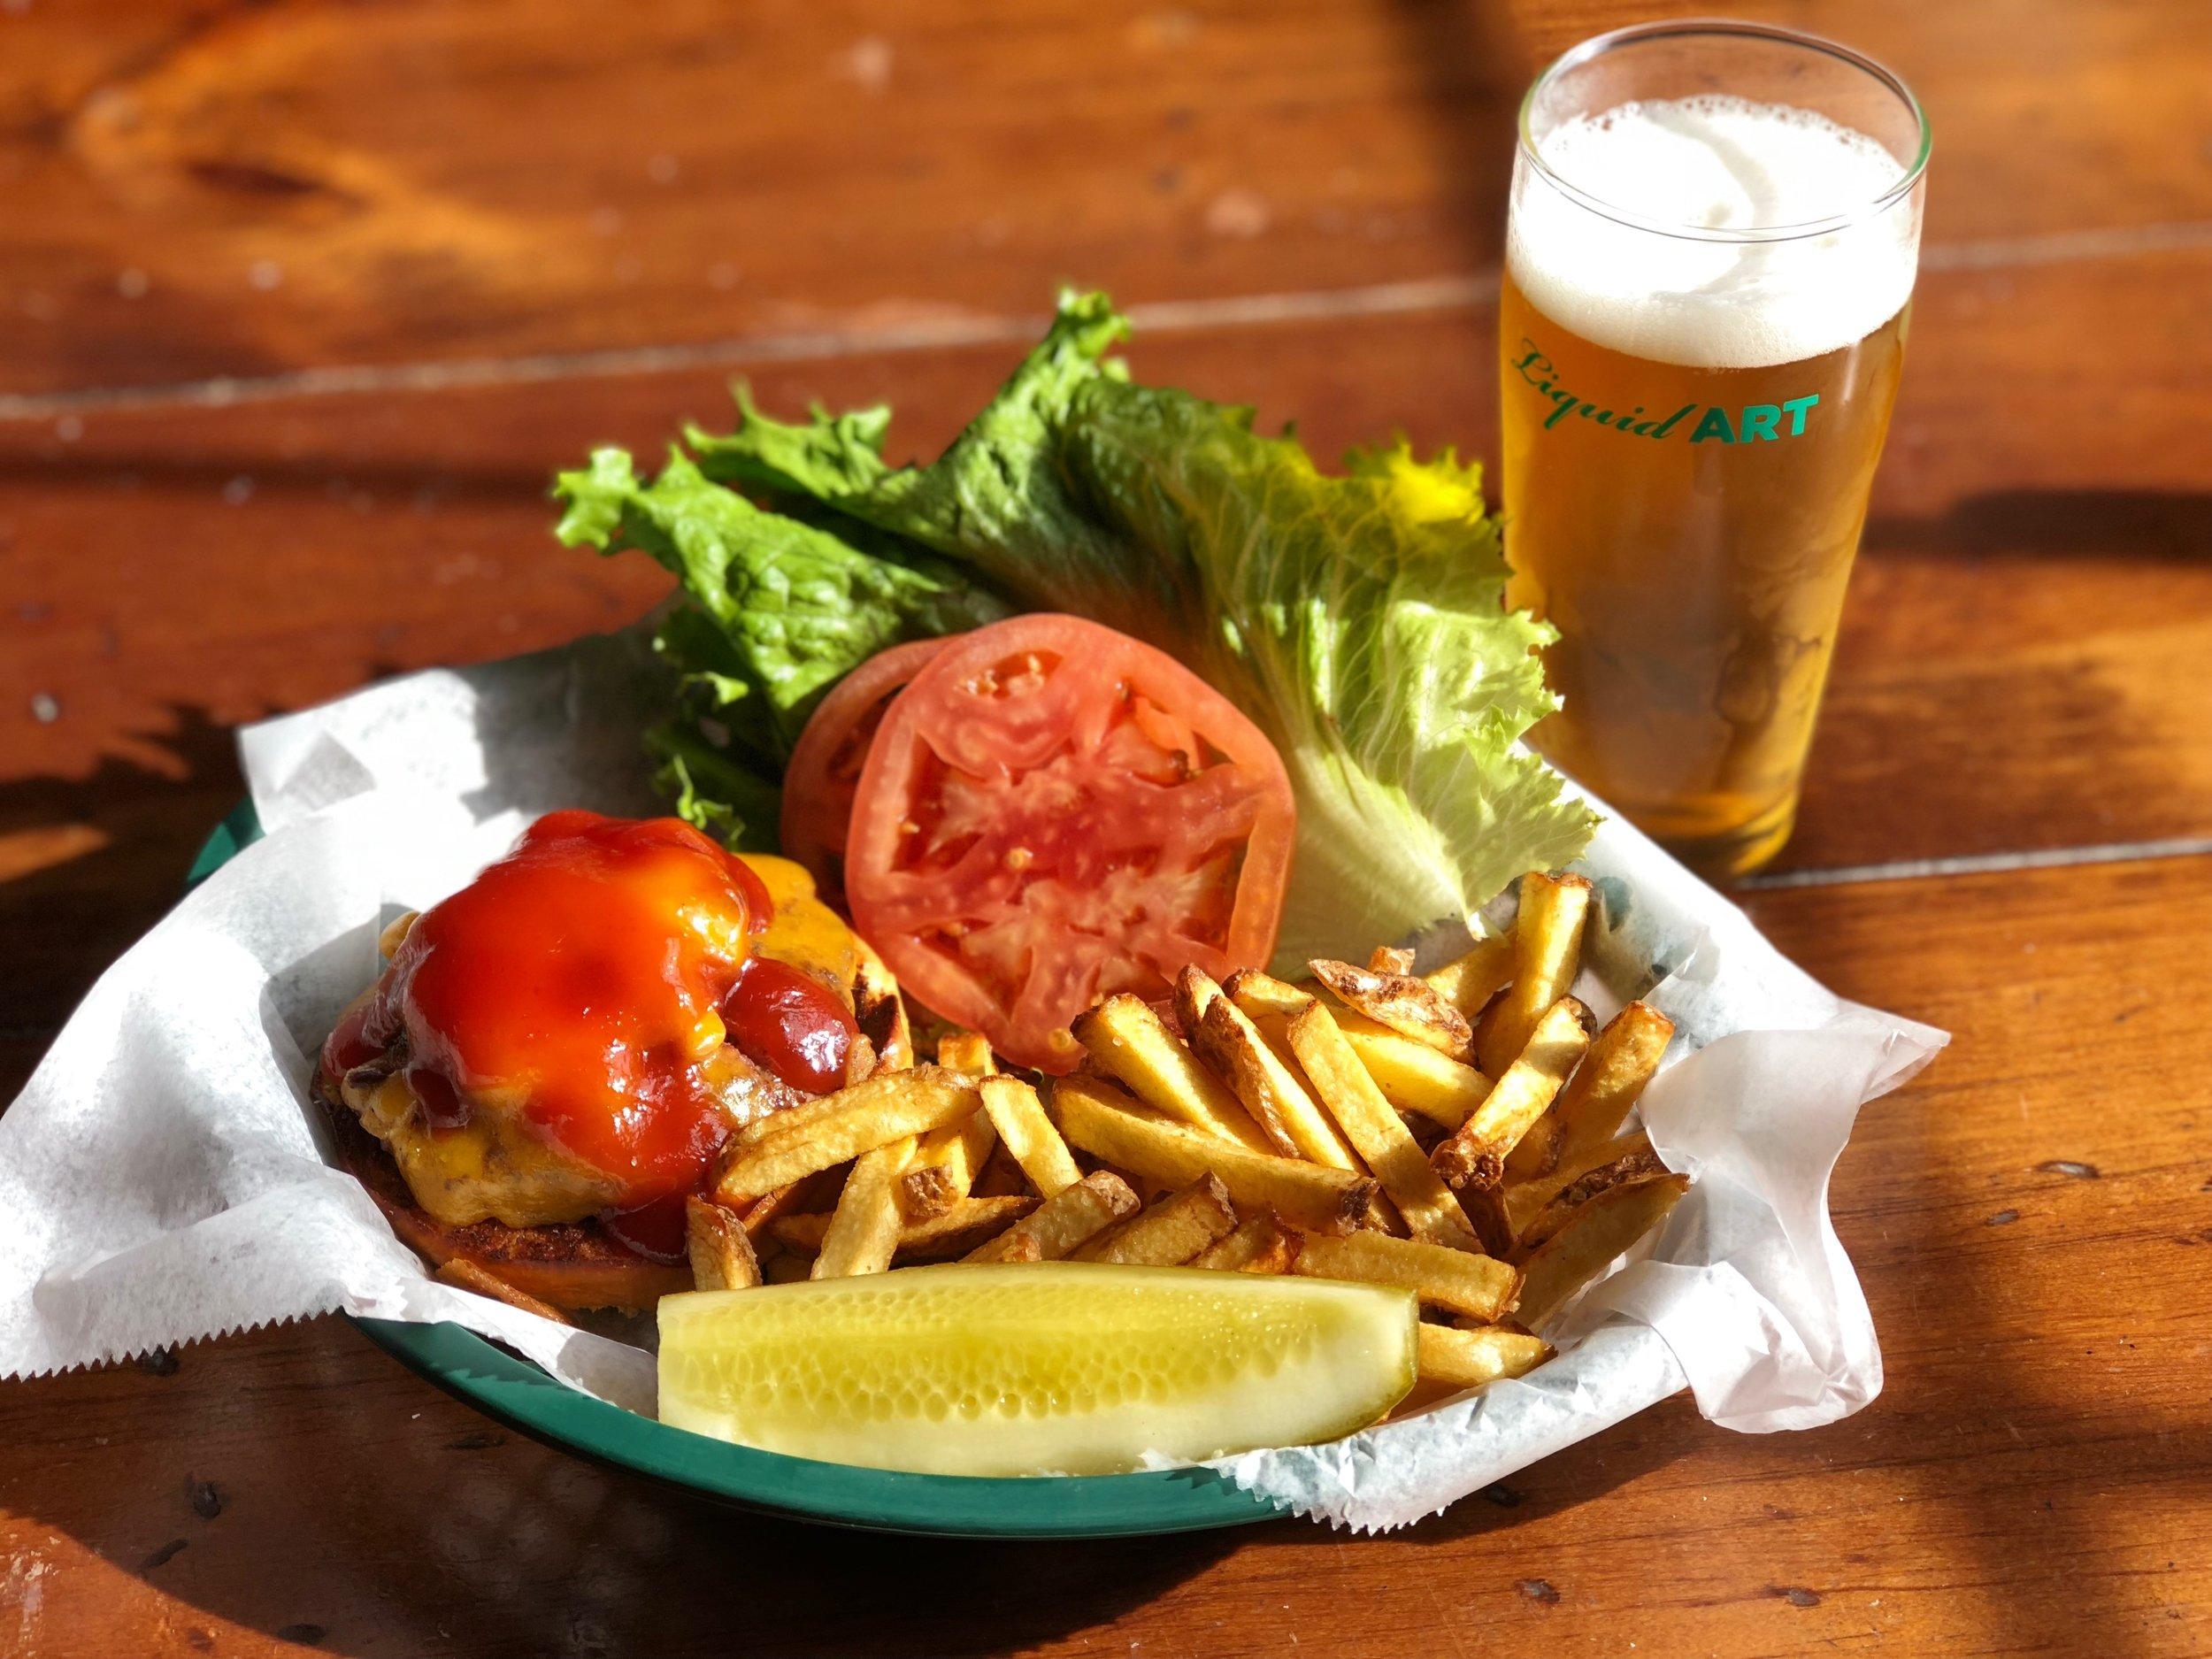 Maple Bacon Cheddar Burger